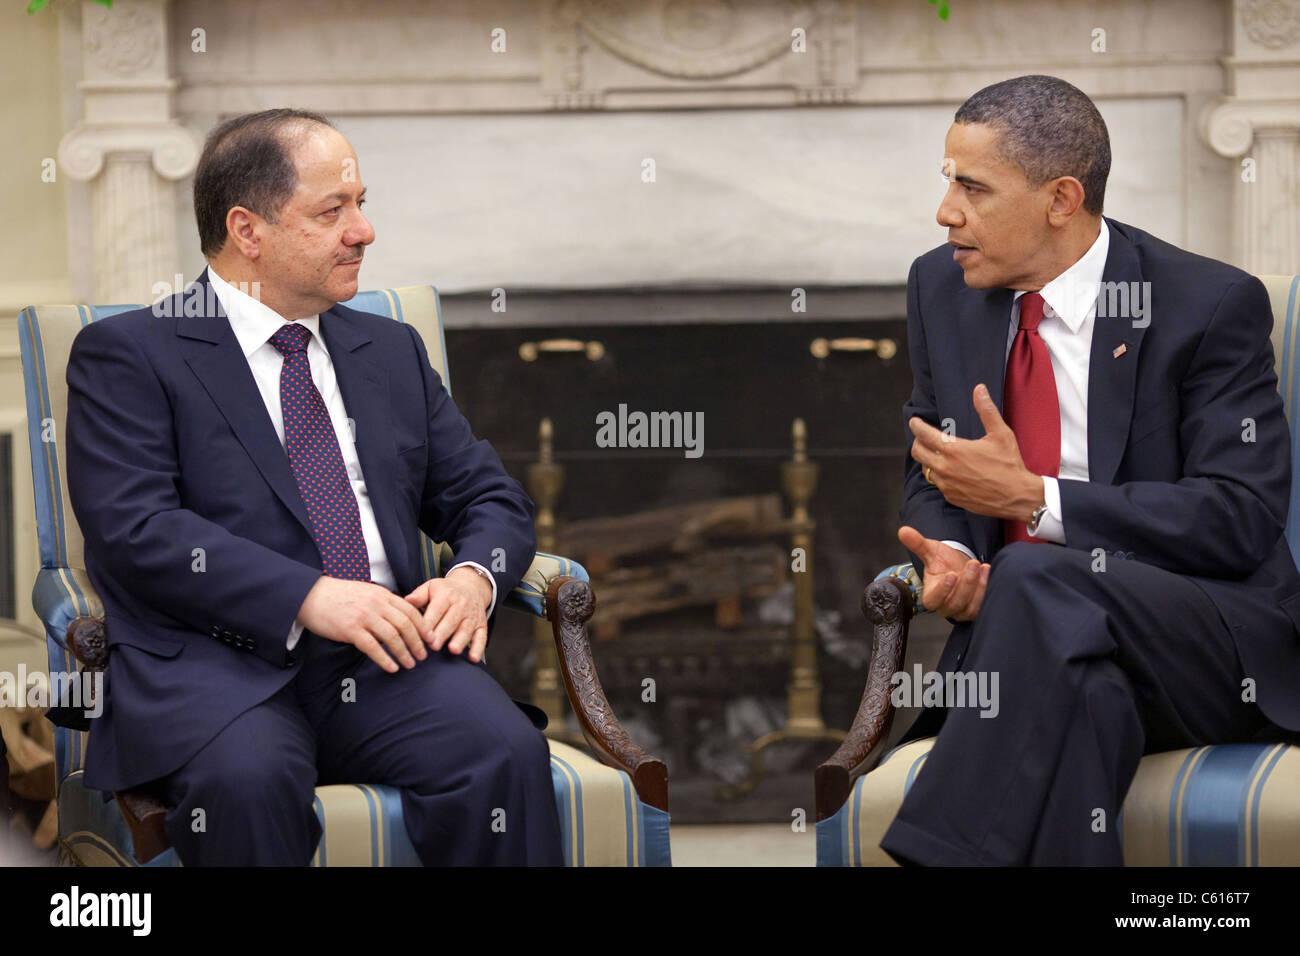 Präsident Obama trifft sich mit Masoud Barzani Präsident des Irak Kurdistan Region im Oval Office. 25. Stockbild